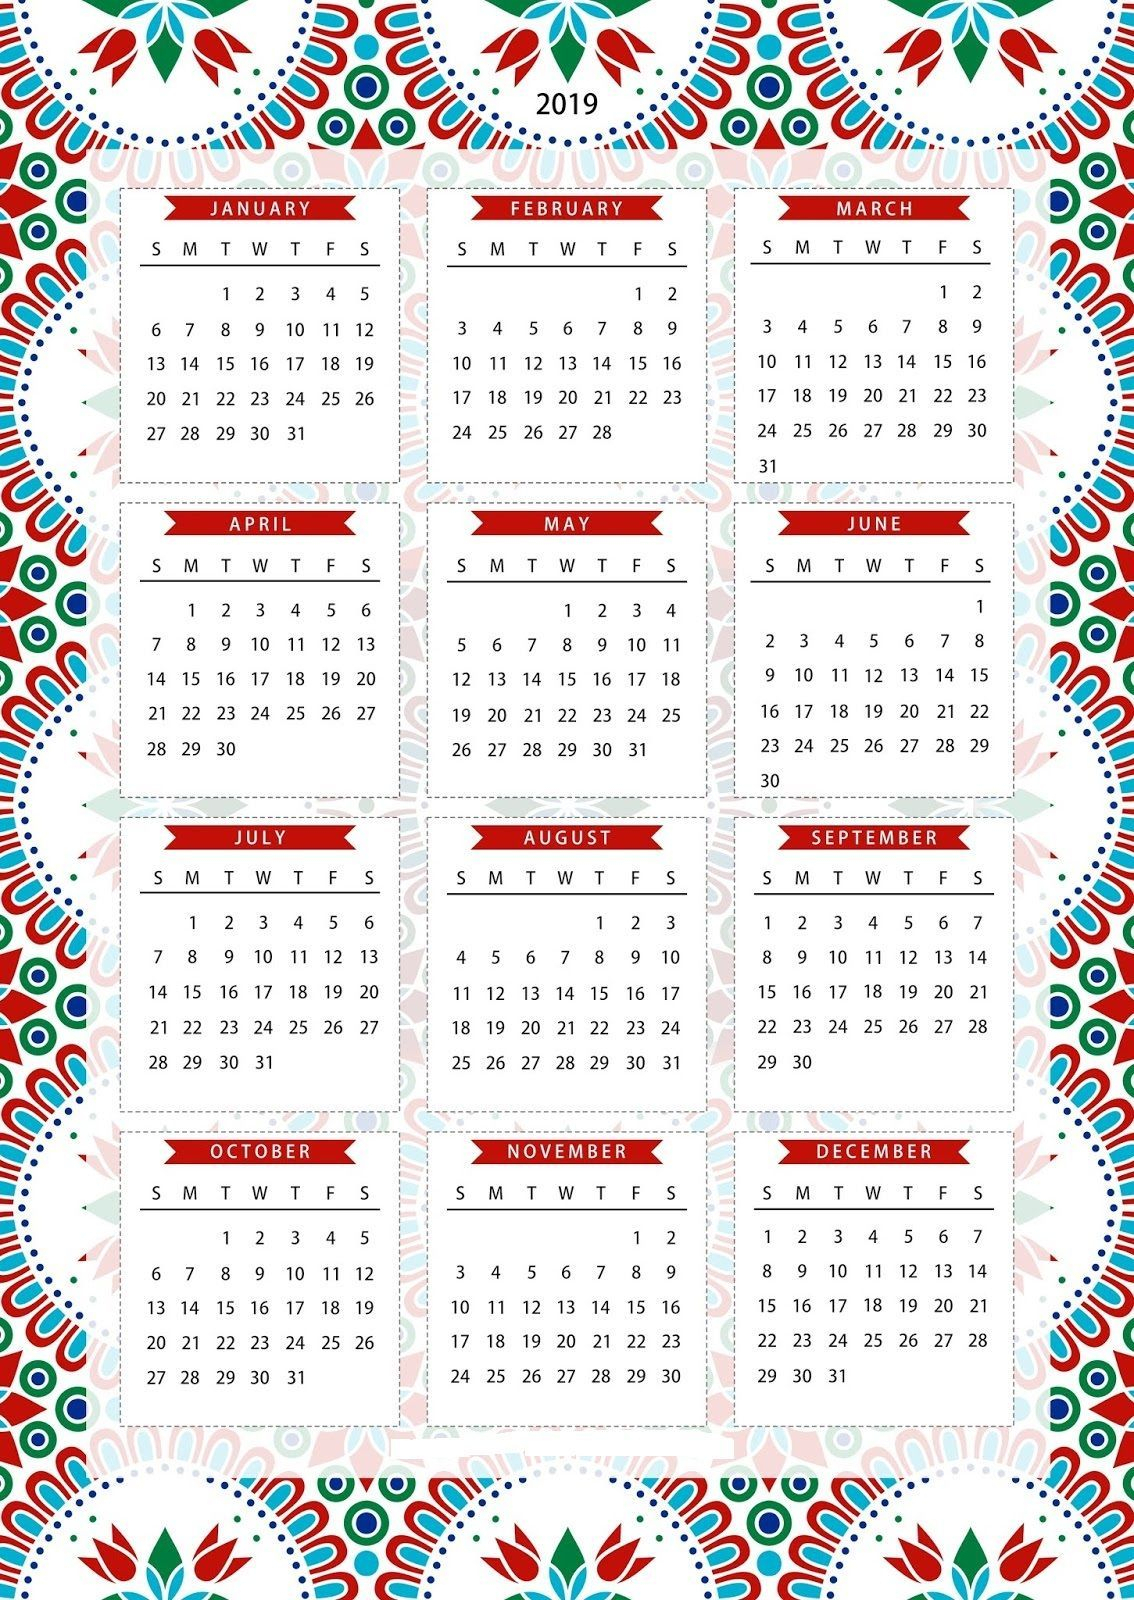 Rilakkuma Calendar 2019 Printable | Create Calendar Online 2019 - 2020 within Free Printable Unicorn Calendar 2019-2020